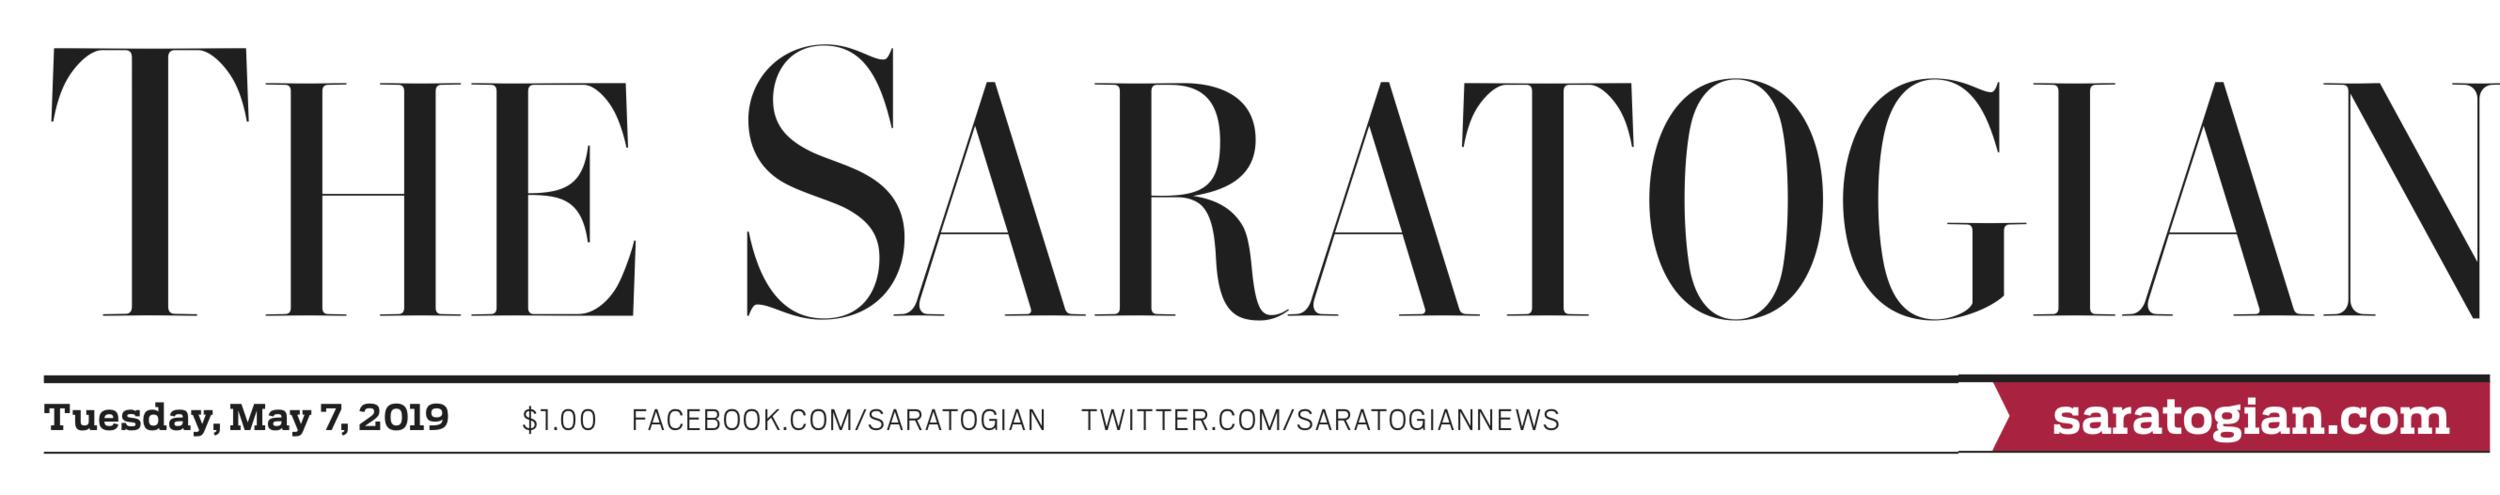 TheSaratogian-Logo.png